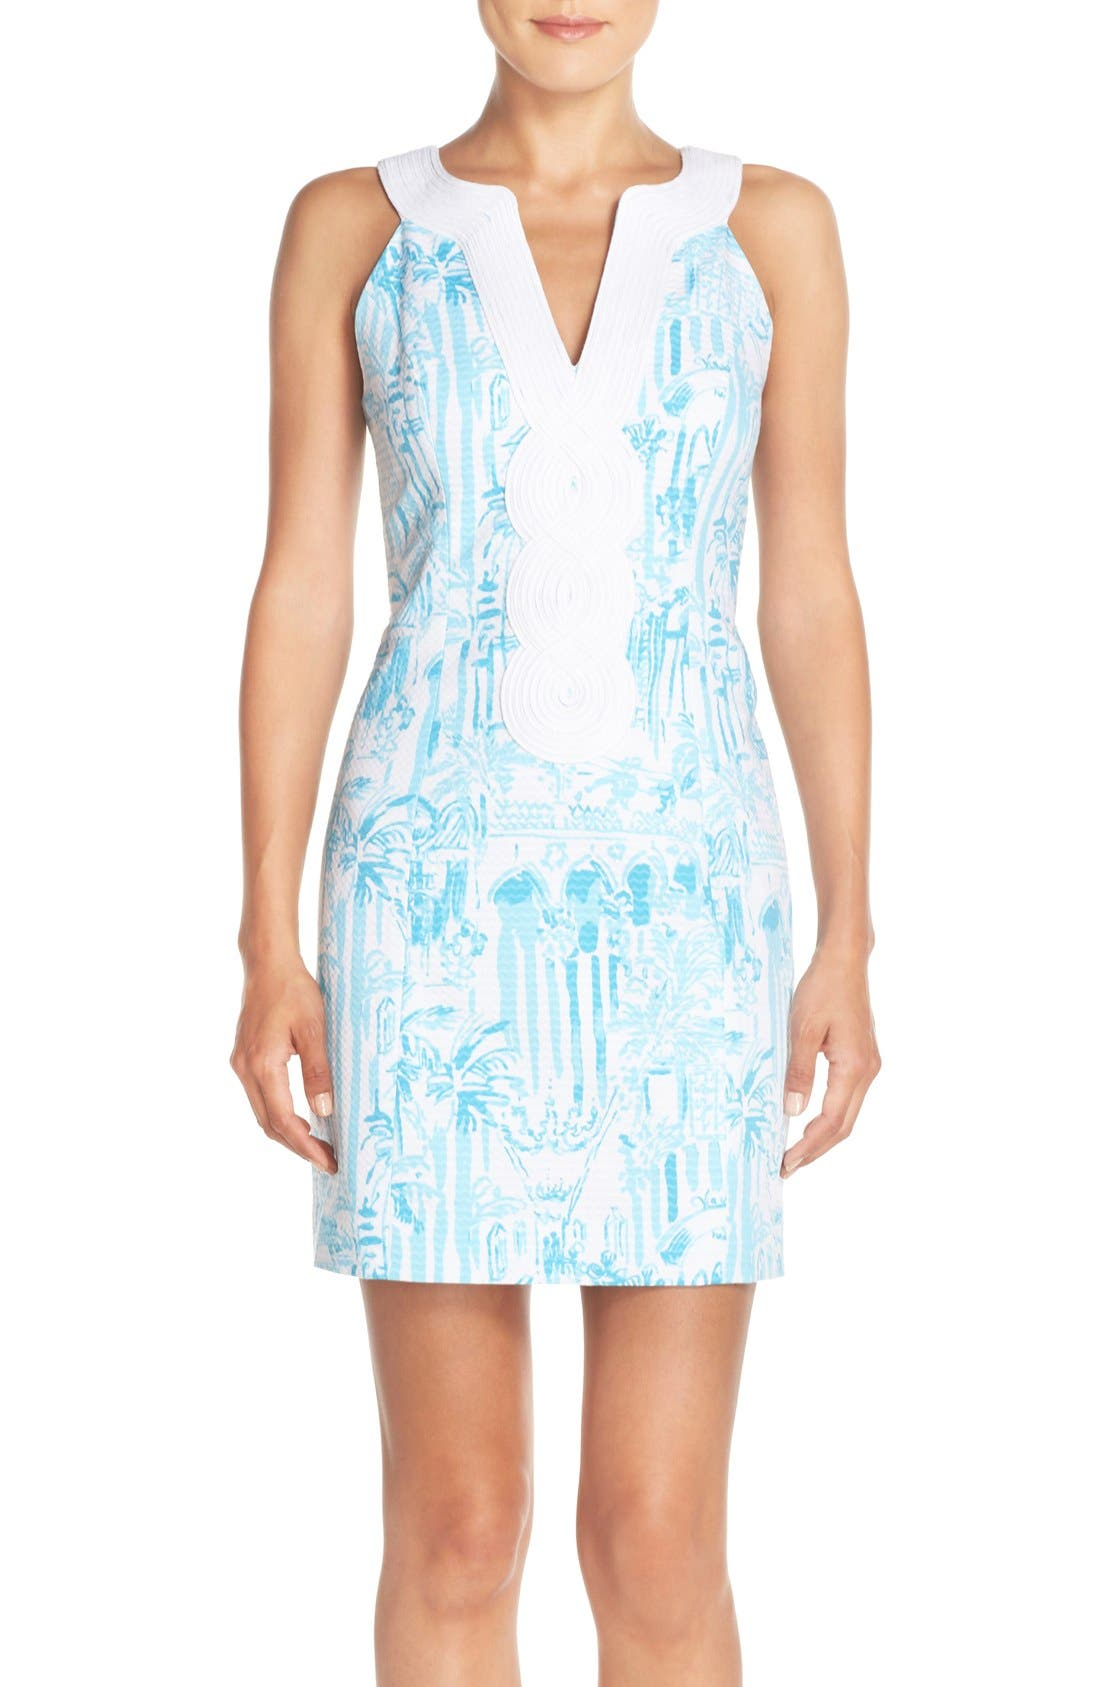 Alternate Image 1 Selected - Lilly Pulitzer® 'Valli' Soutache Print Jacquard Sheath Dress